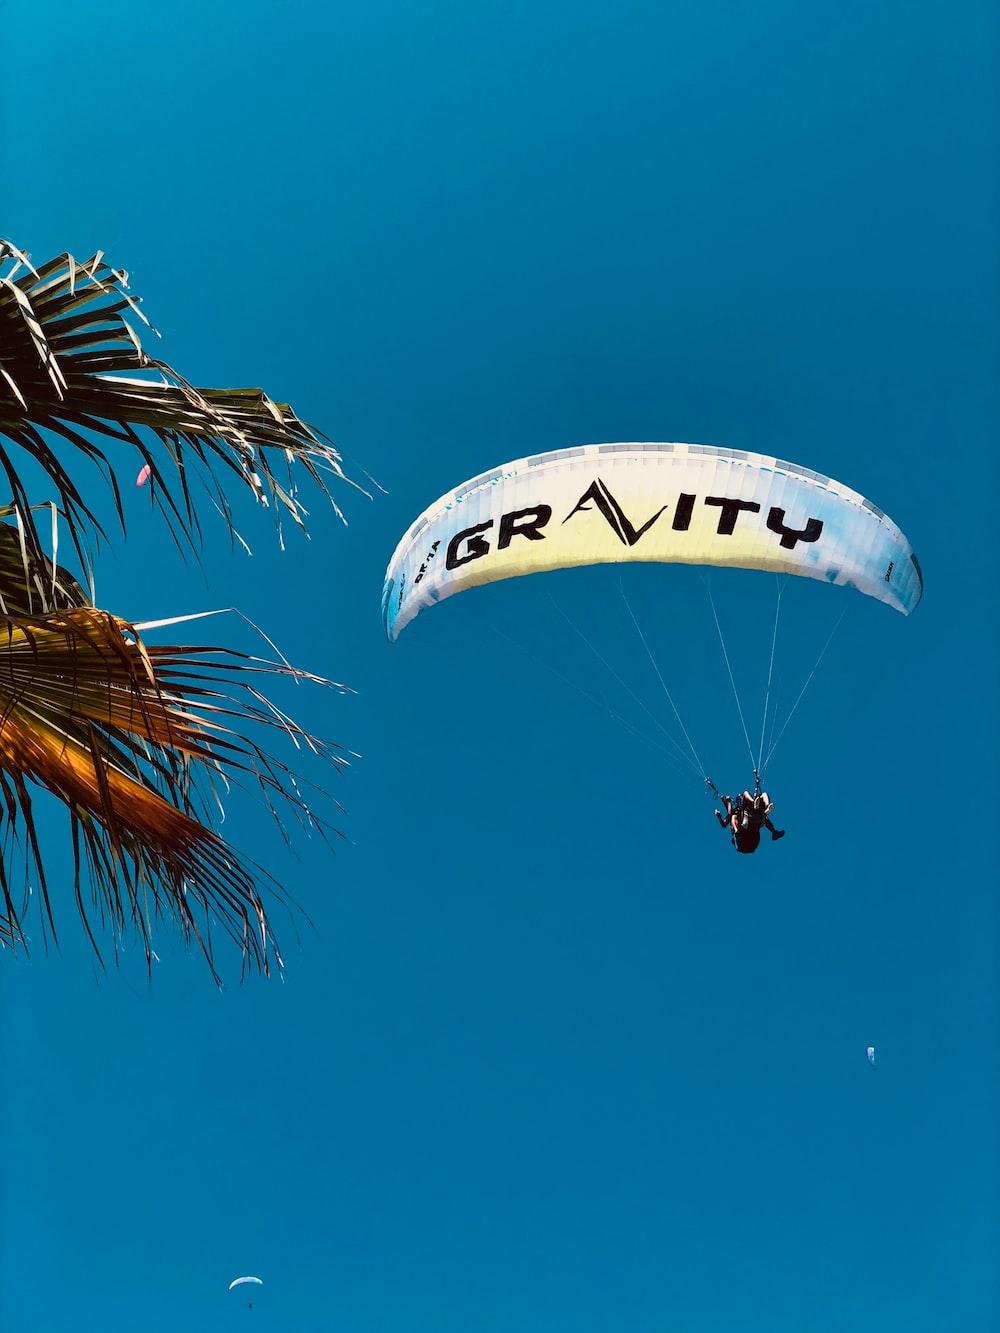 people riding parachute during daytime